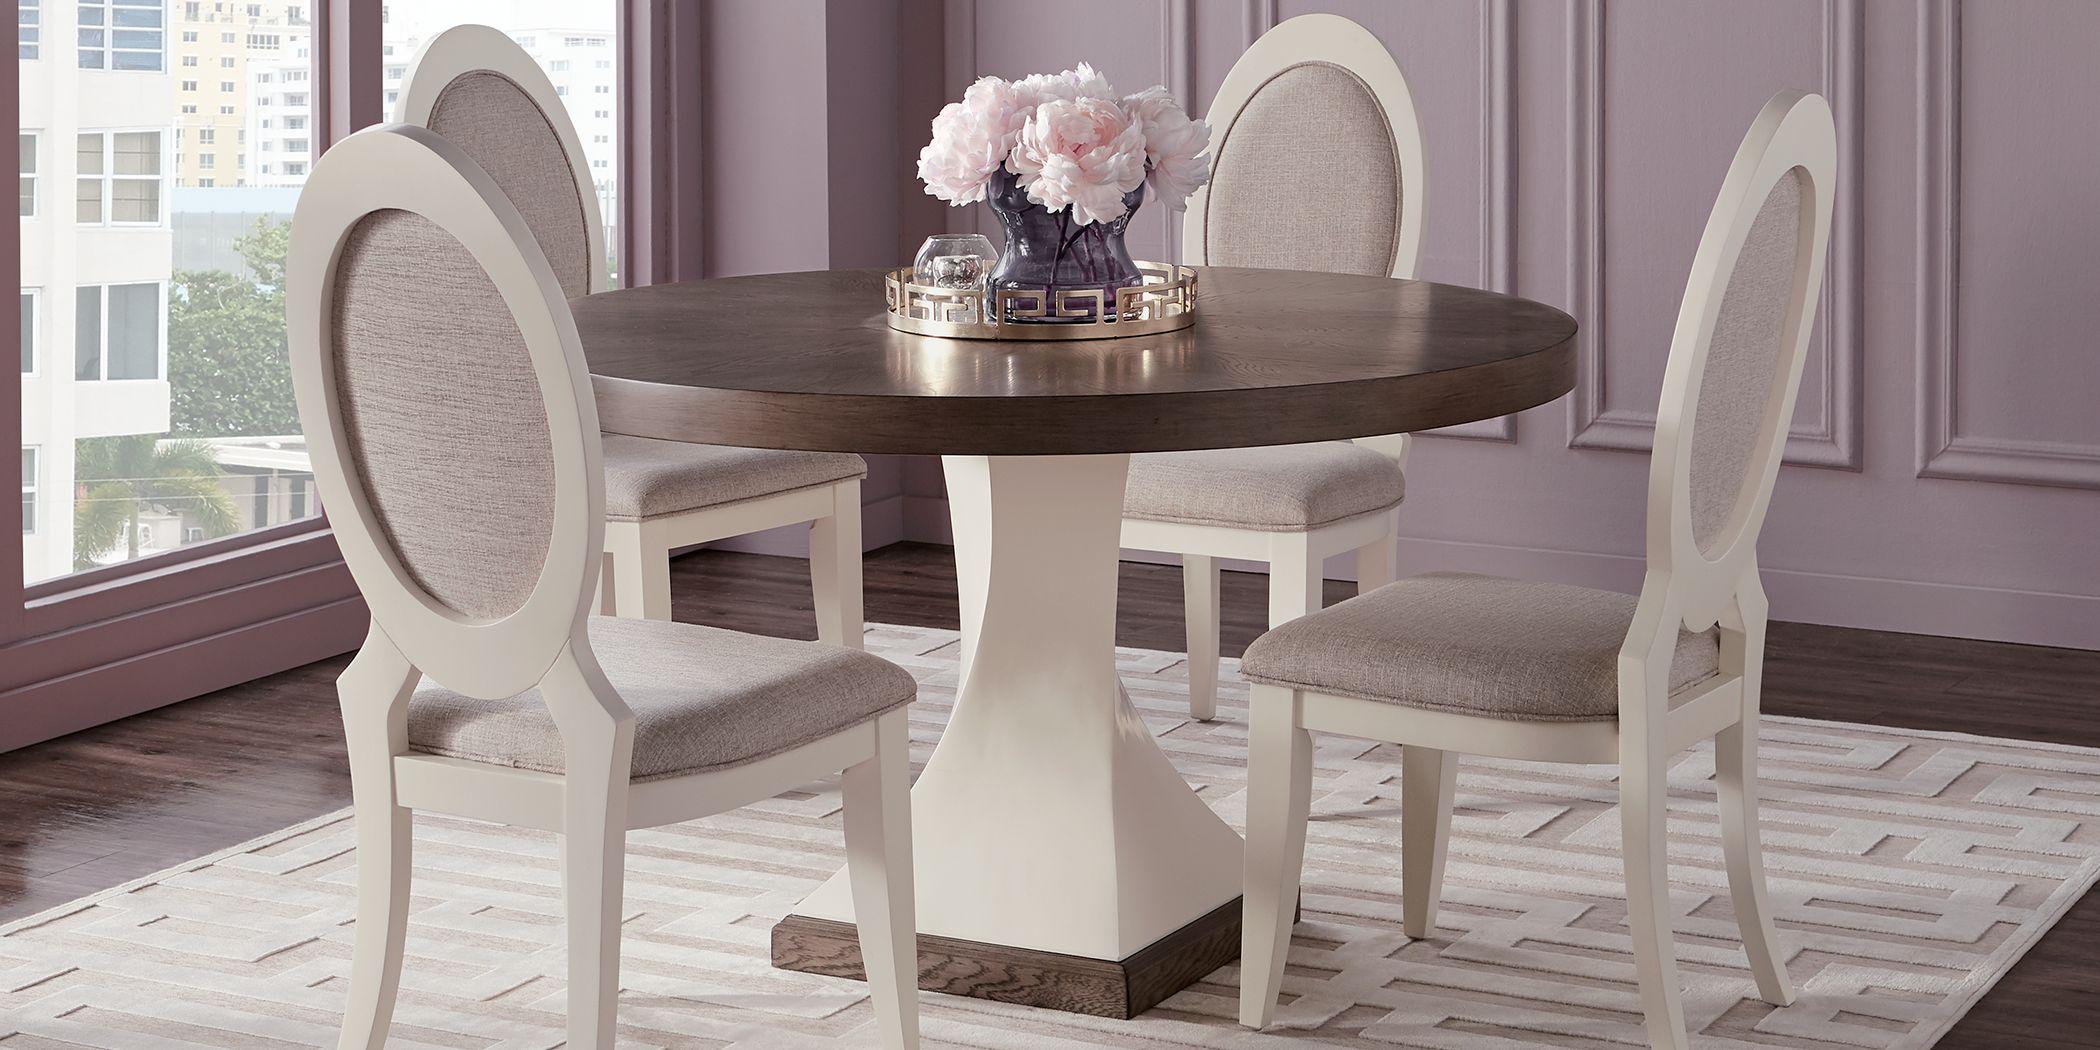 Sofia Vergara Santa Fiora White 5 Pc Round Dining Room